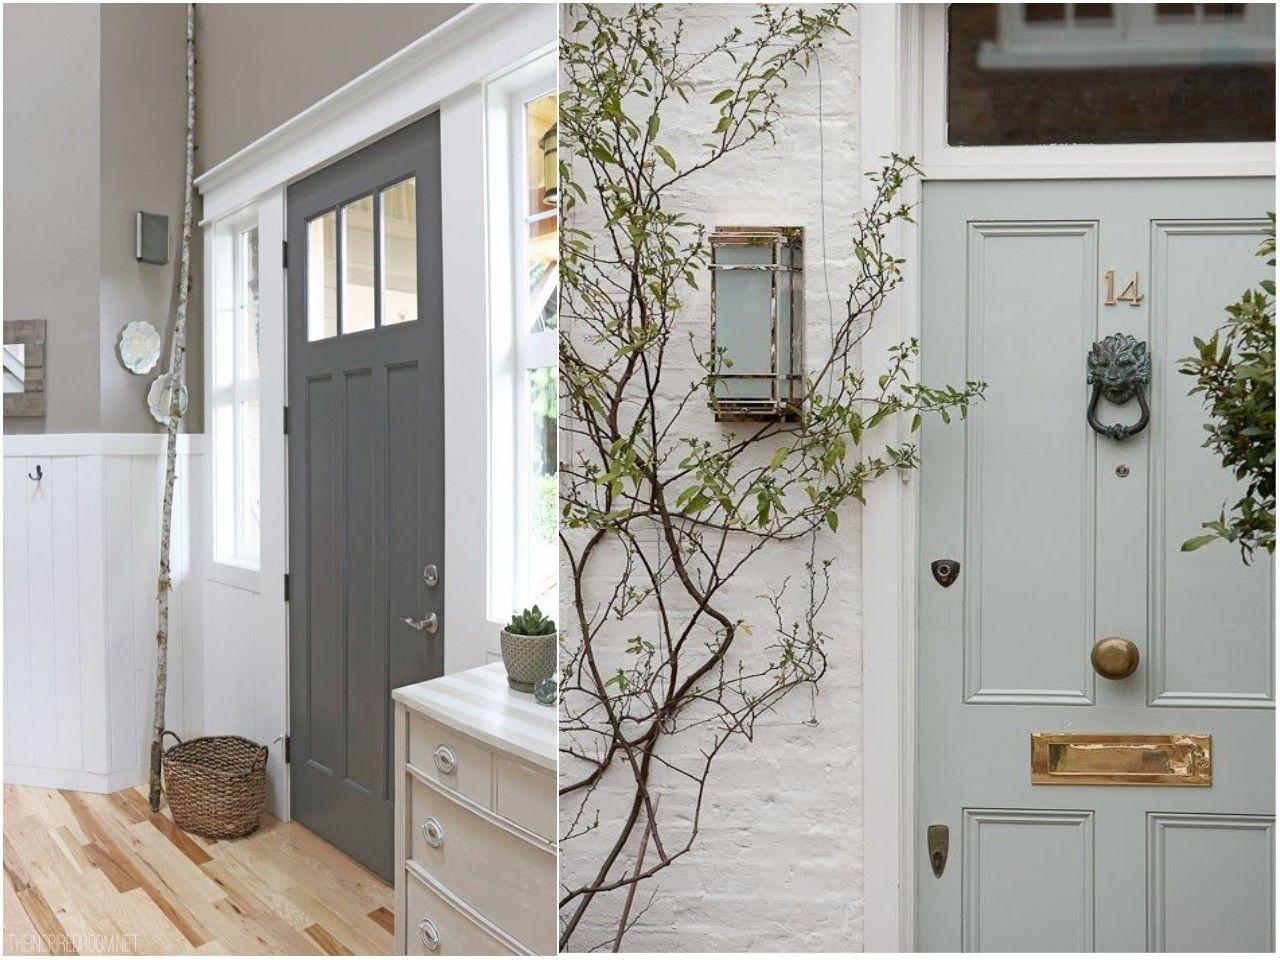 C mo pintar las puertas de casa ideas e inspiraci n for Colores para afuera de la casa